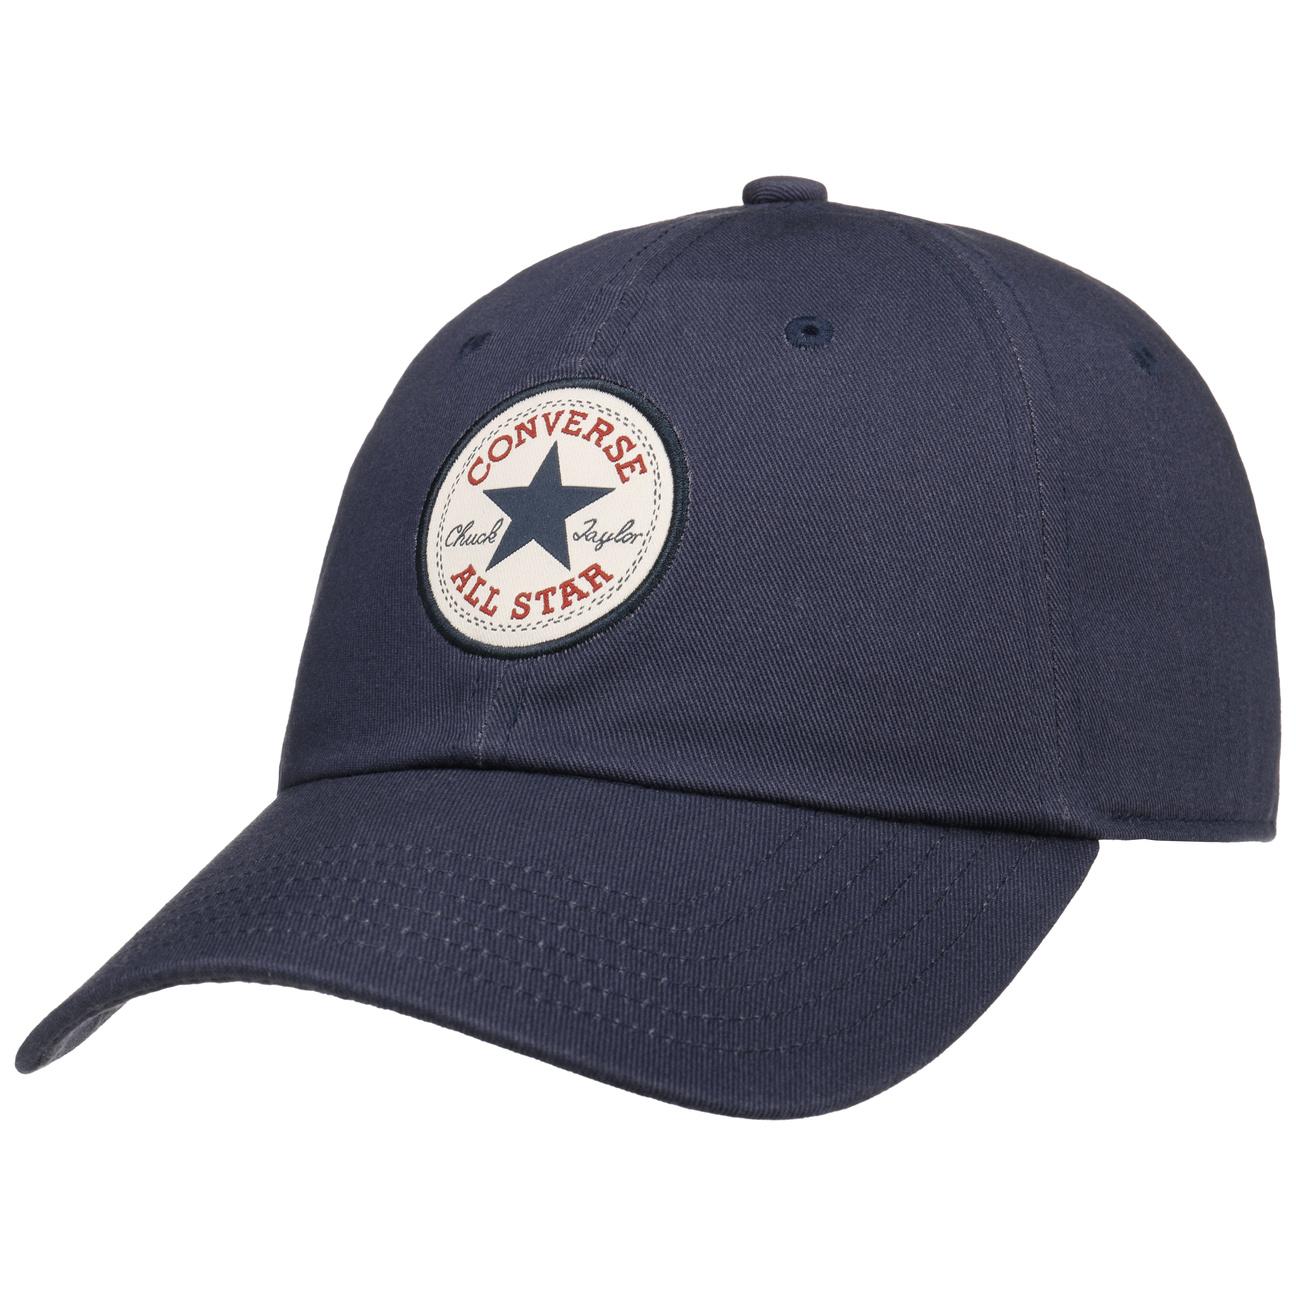 b58b9f68579 ... Core Classic Baseball Cap by Converse - bordeaux 5 ...